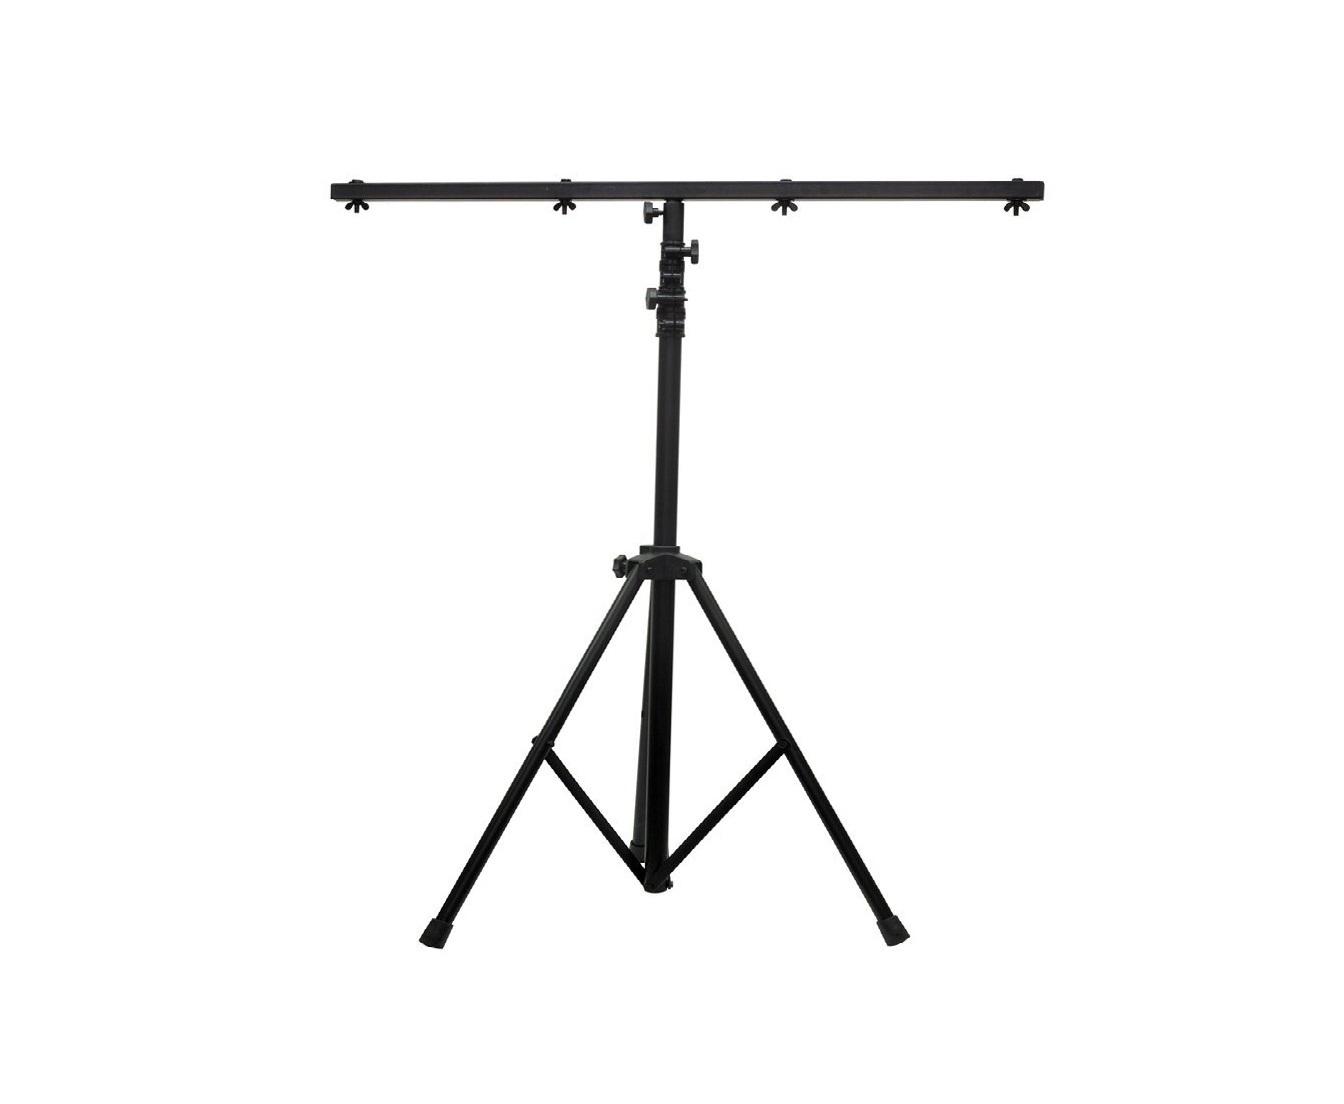 3457-heavy-duty-80kg-studio-tripod-t-bar-lighting-stand-event-disco-03